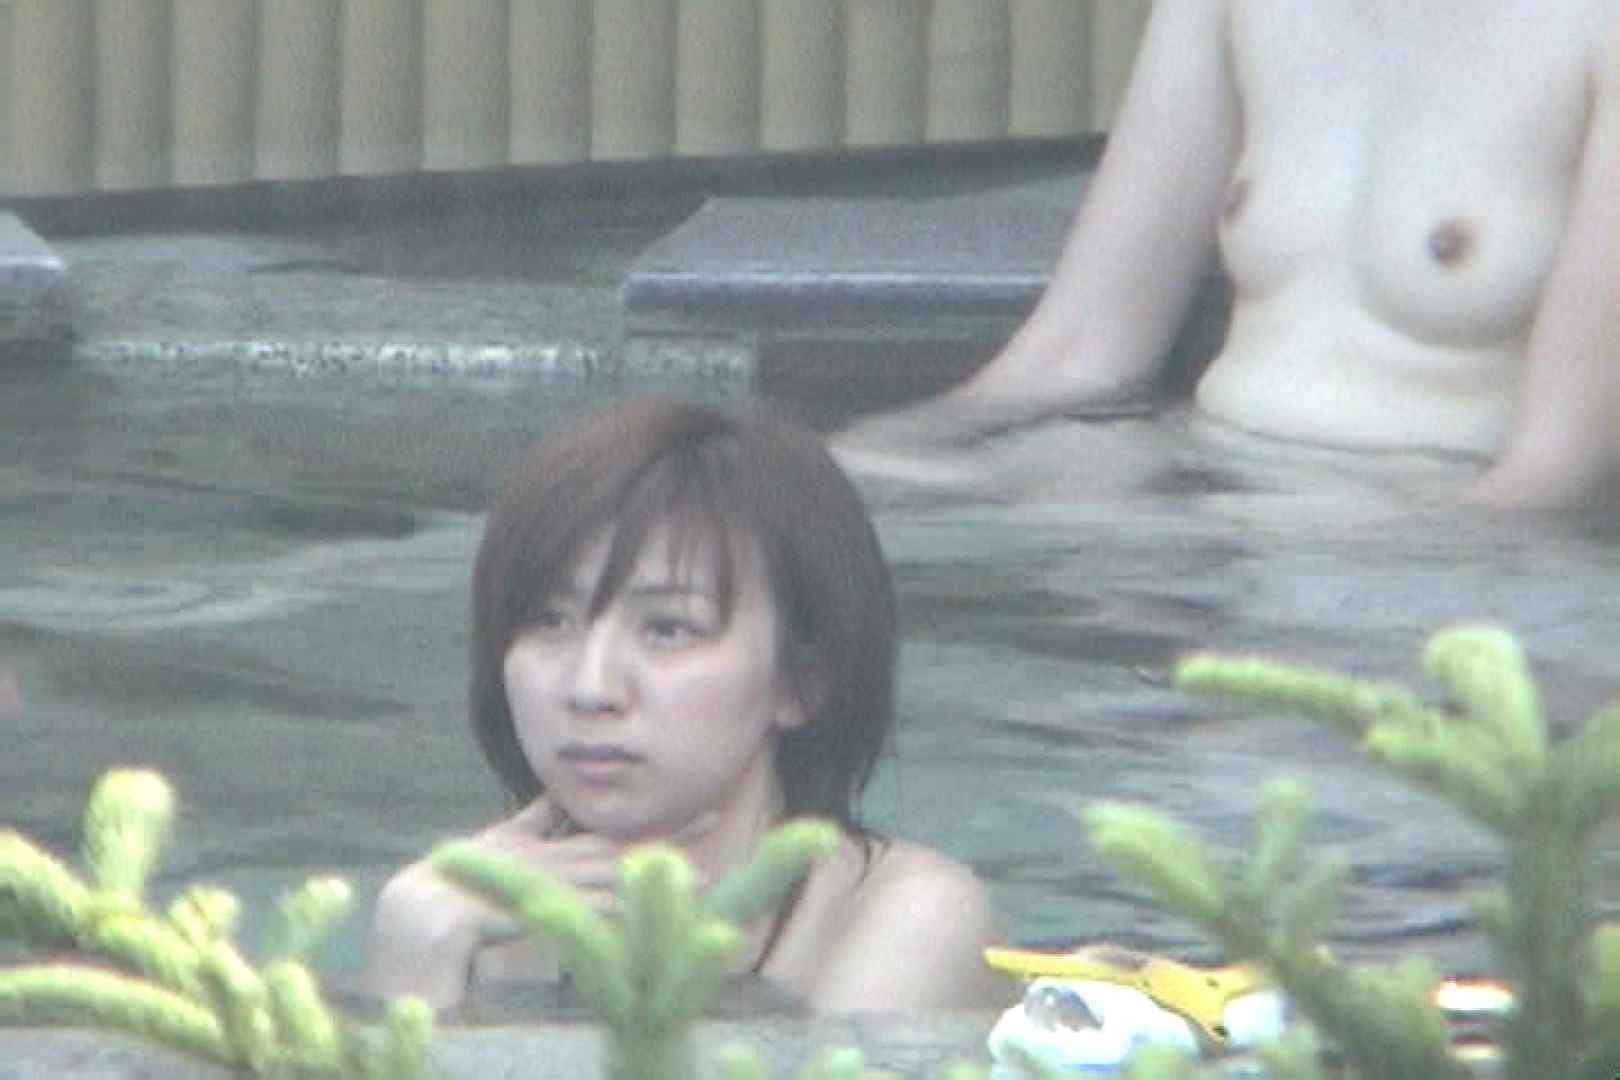 Aquaな露天風呂Vol.77【VIP限定】 露天   盗撮特集  98画像 9